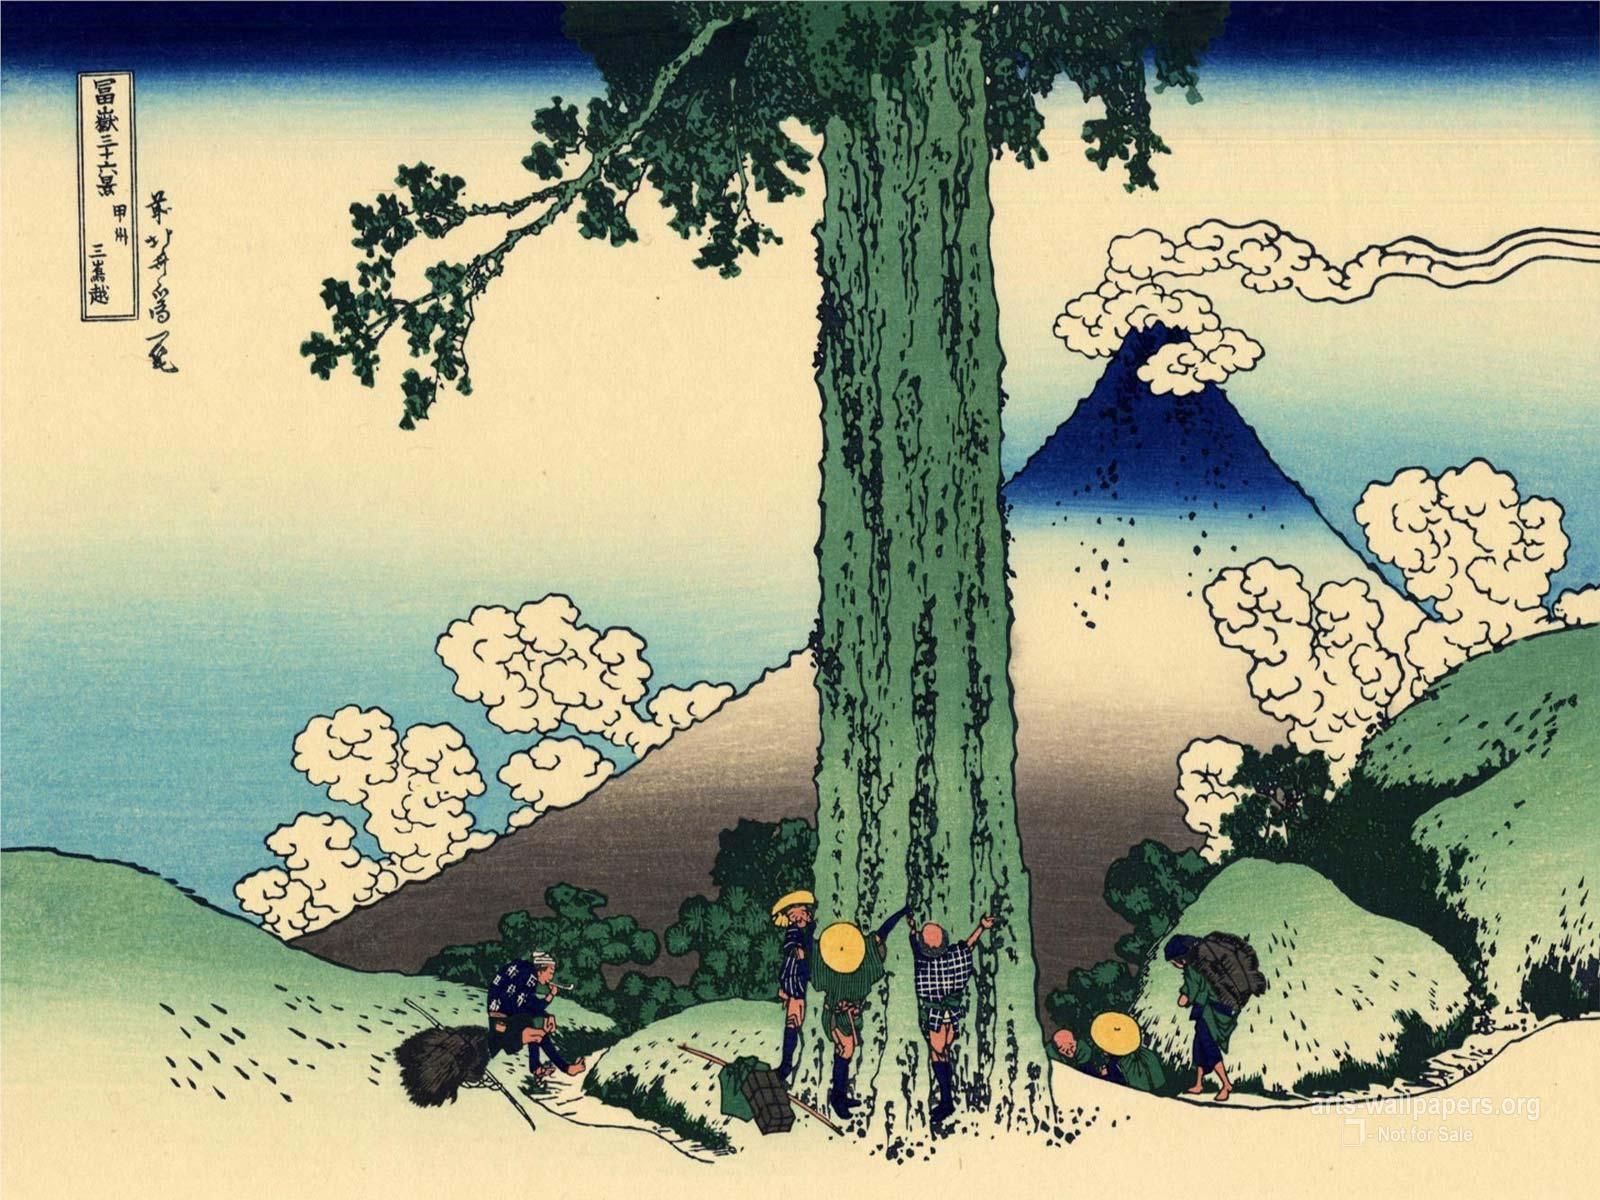 Hokusai Katsushika Wallpapers Paintings Art Wallpapers Desktop Art 1600x1200